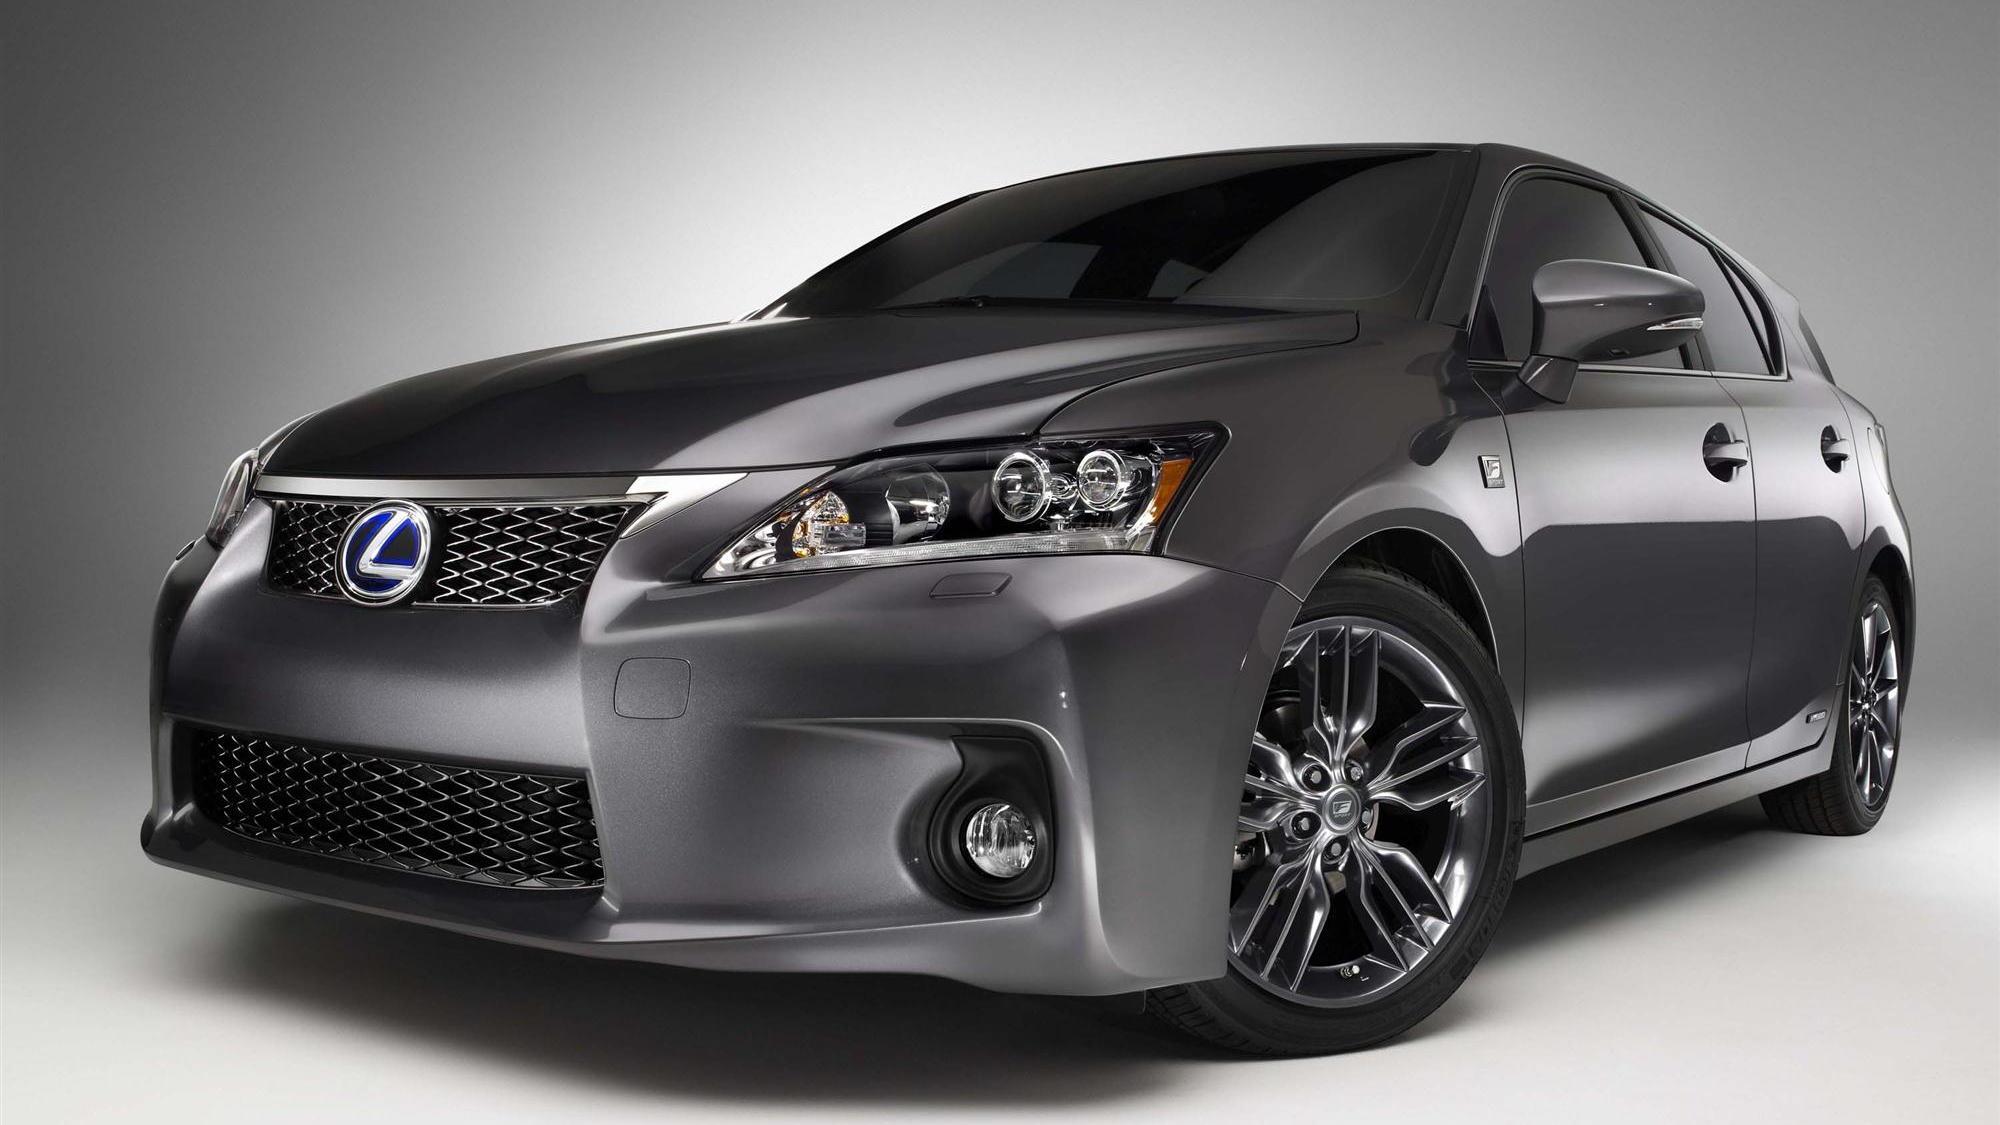 2012 Lexus CT 200h Sport Special Edition